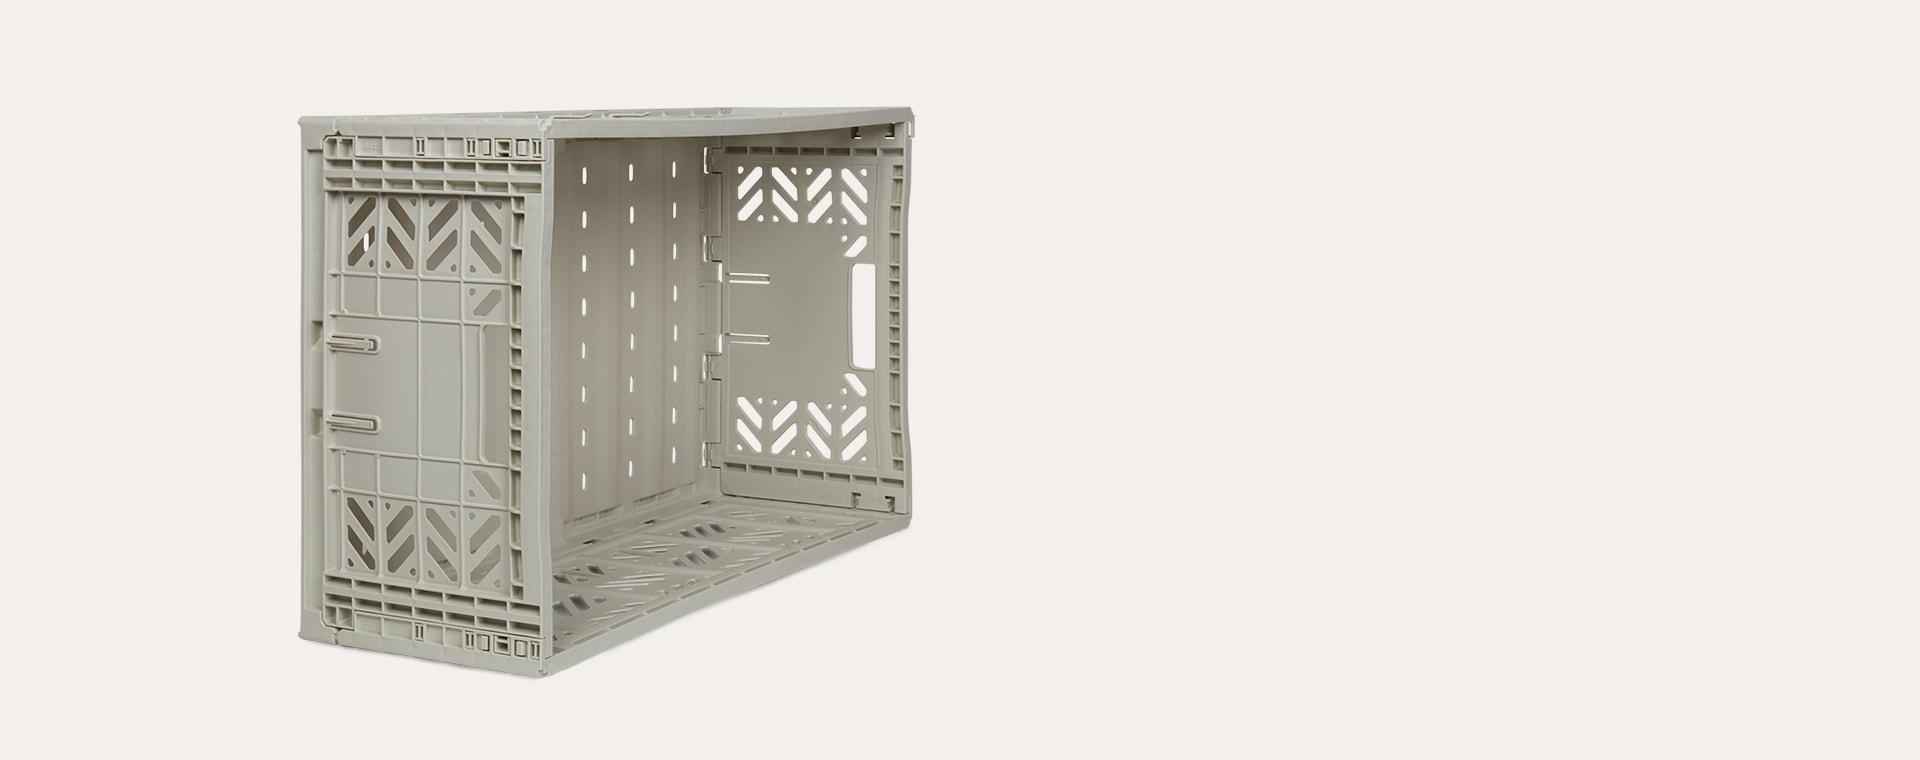 Light Grey Aykasa Maxi Crate